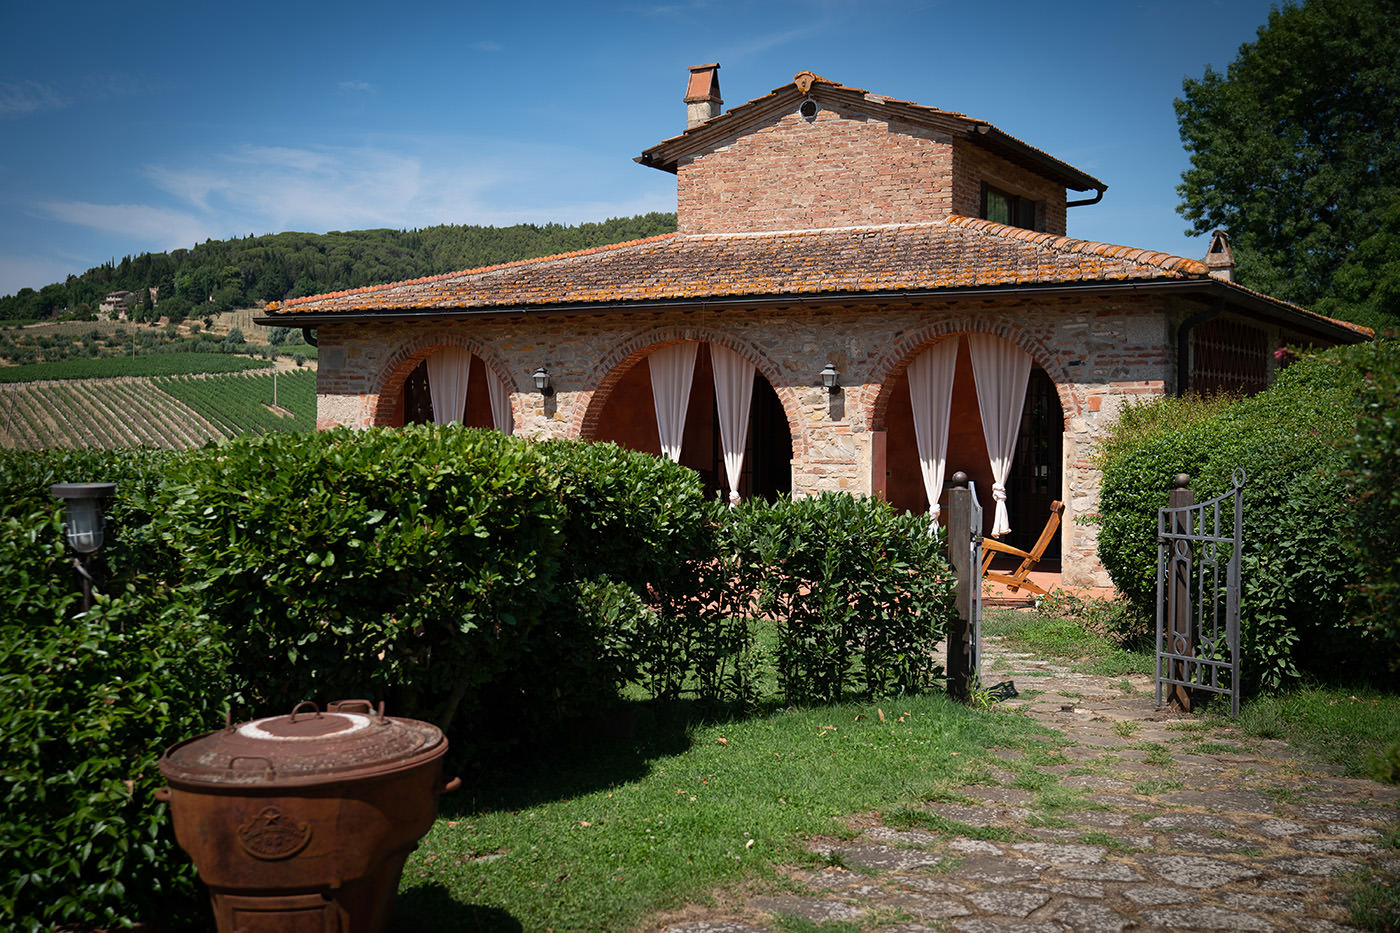 Tuscan Wedding Photo Shoots At Palagio Castle: hotel Fonte de Medici, Tuscany